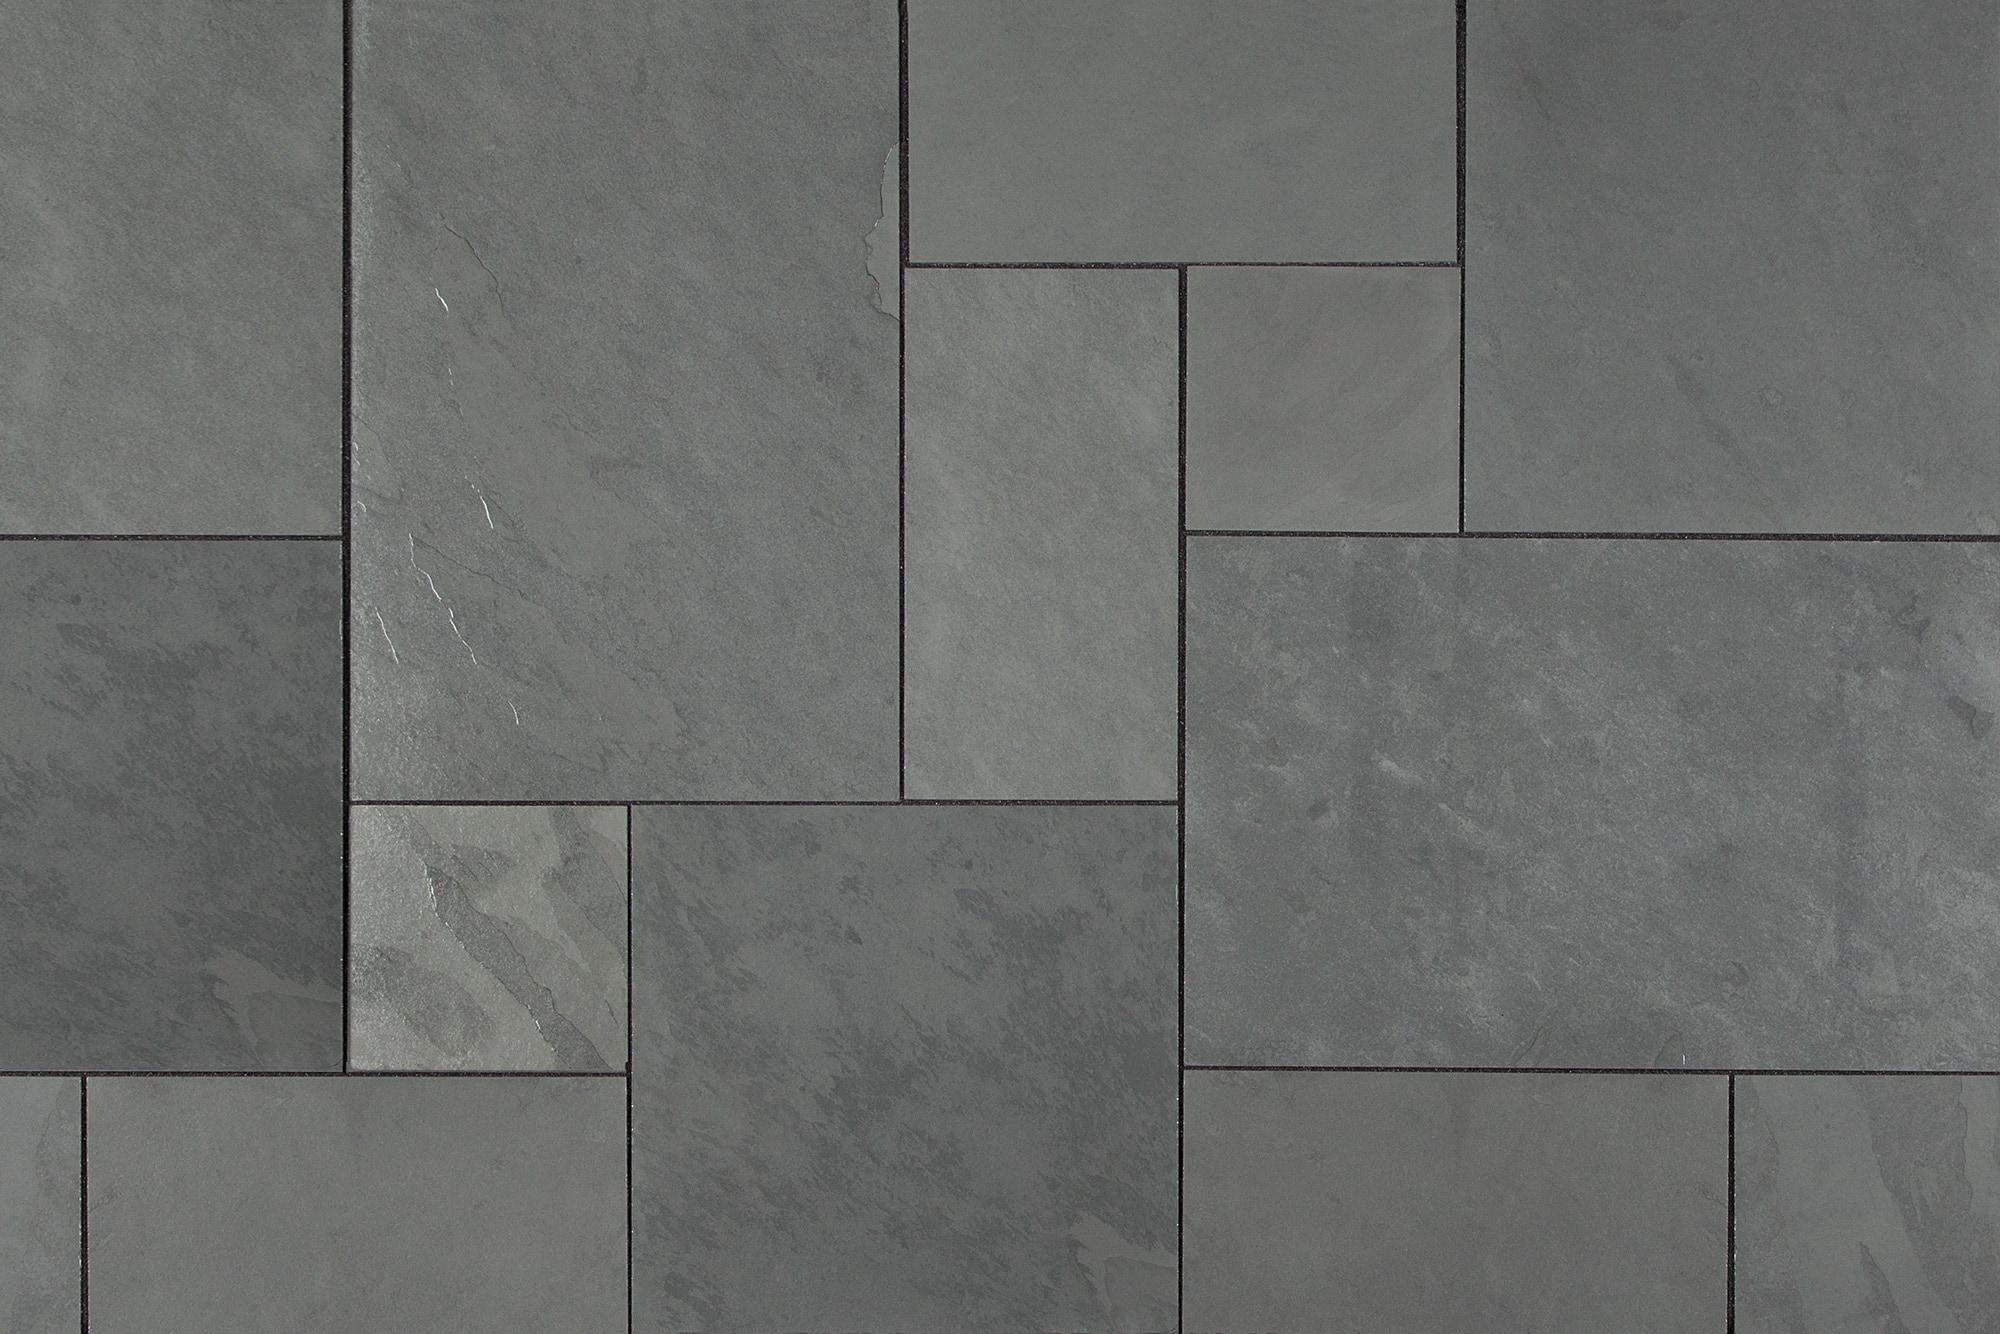 Janeiro slate tile versailles pattern montauk blue versailles janeiro slate tile versailles pattern montauk blue versailles pattern dailygadgetfo Gallery